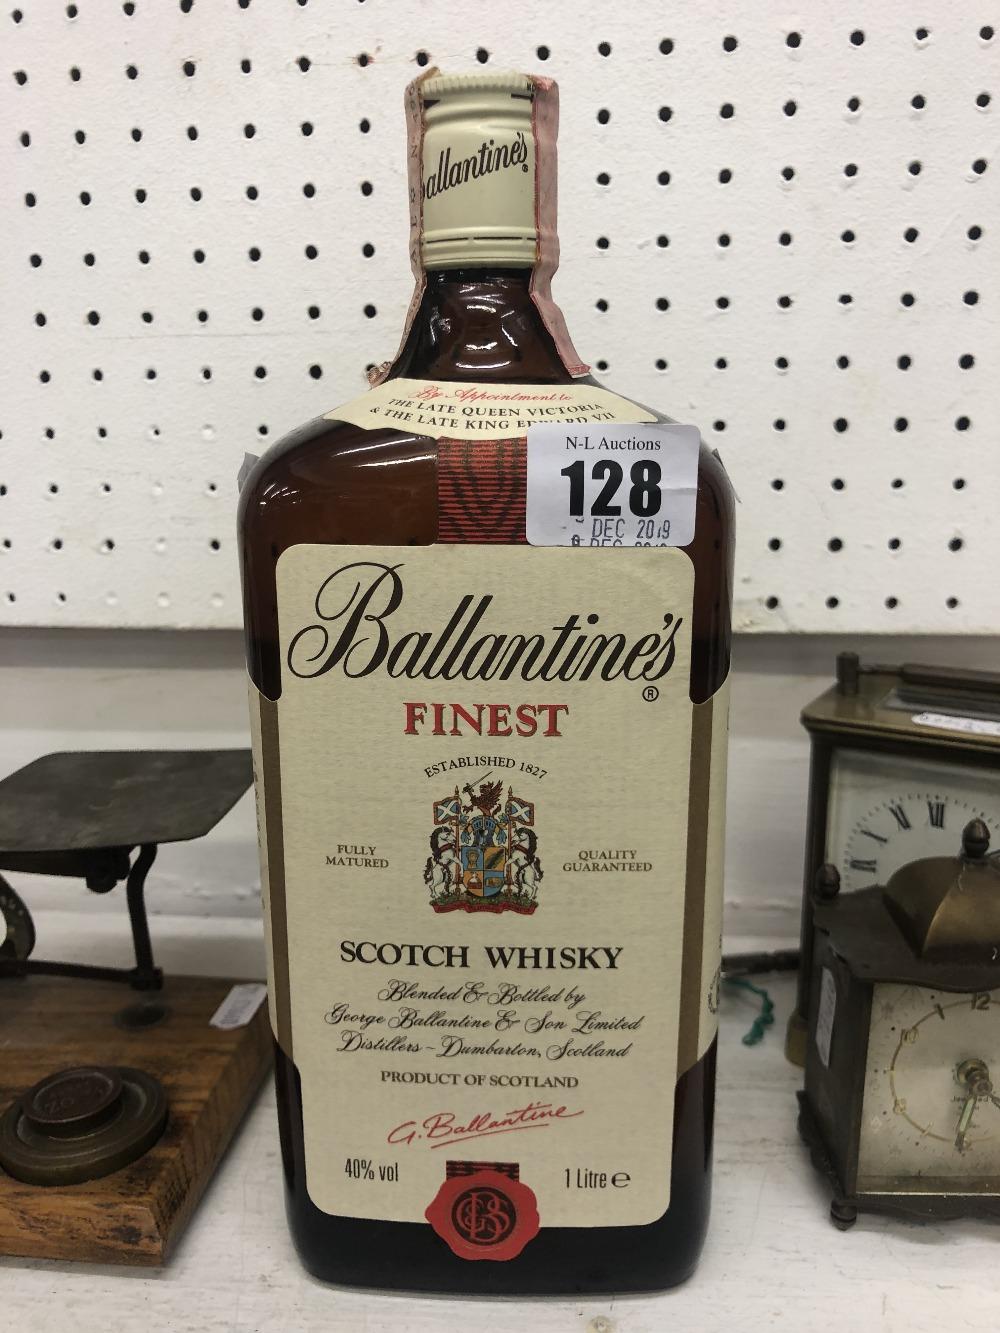 Lot 128 - A 1970's Ballantines finest Scotch Whisky 1 Litre bottle 40 proof,